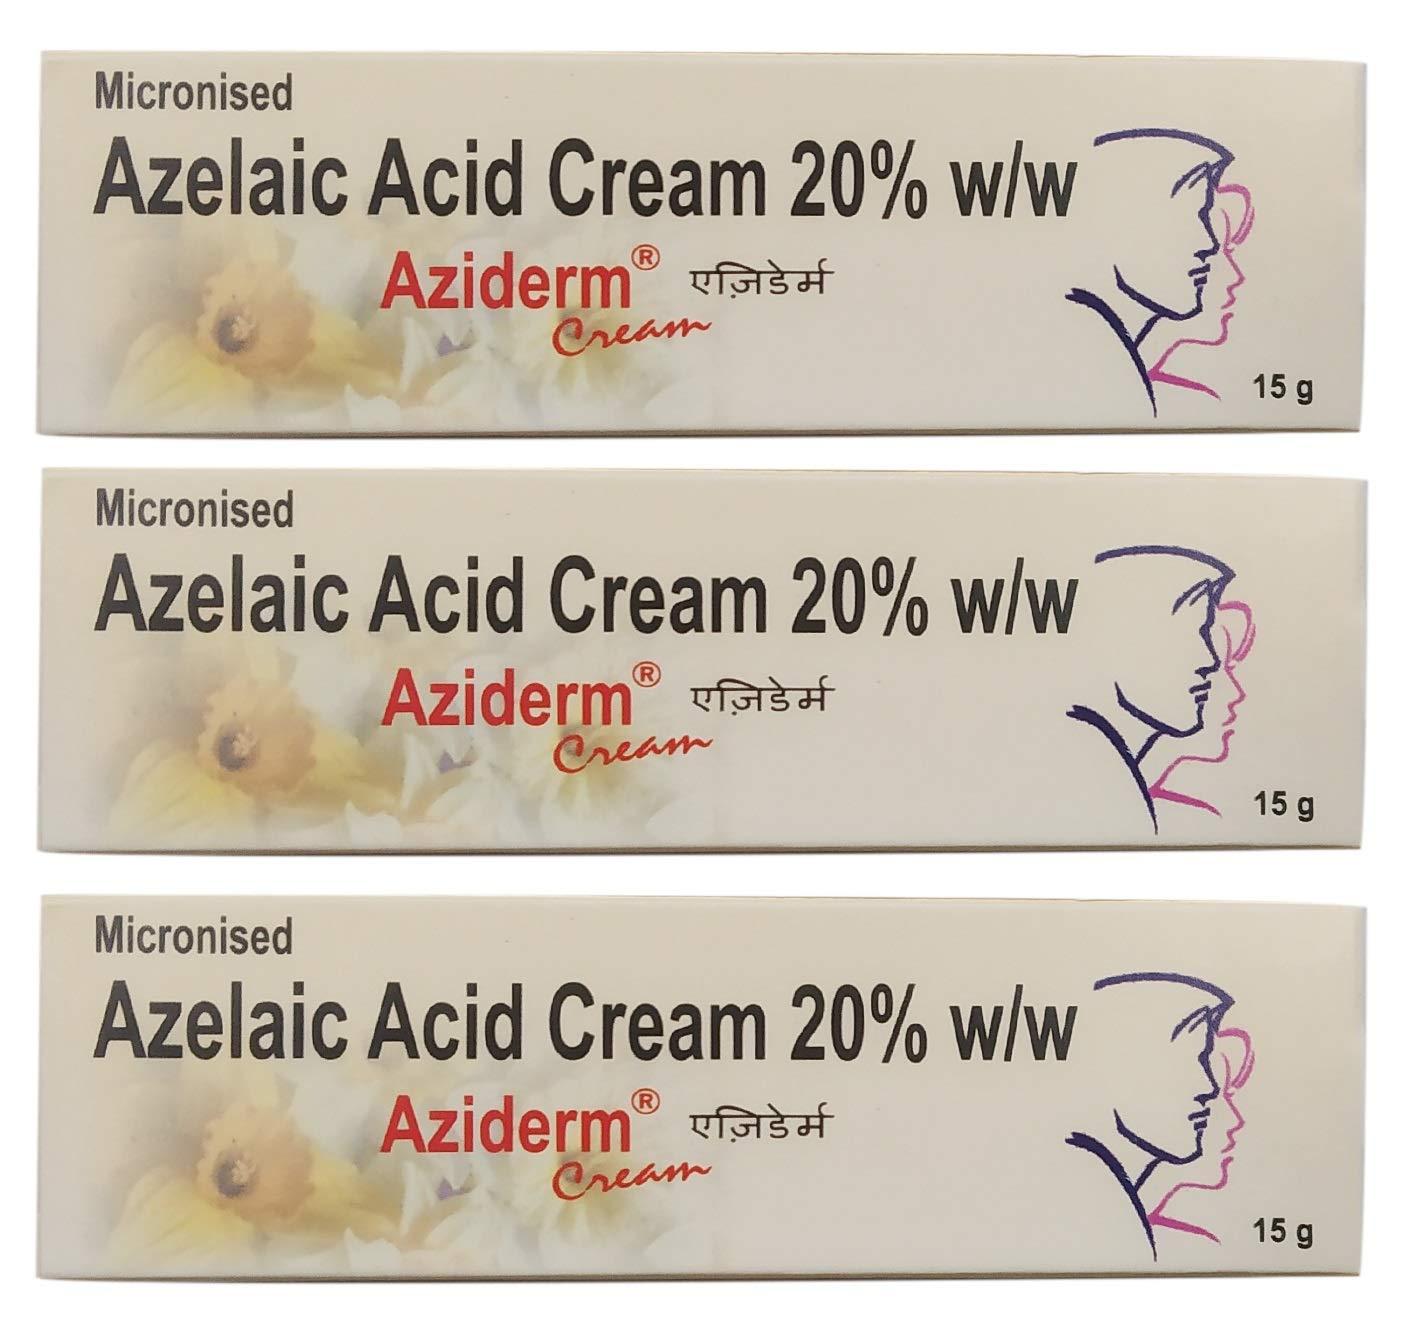 Aziderm 20% Cream (15 g) - Pack of 3